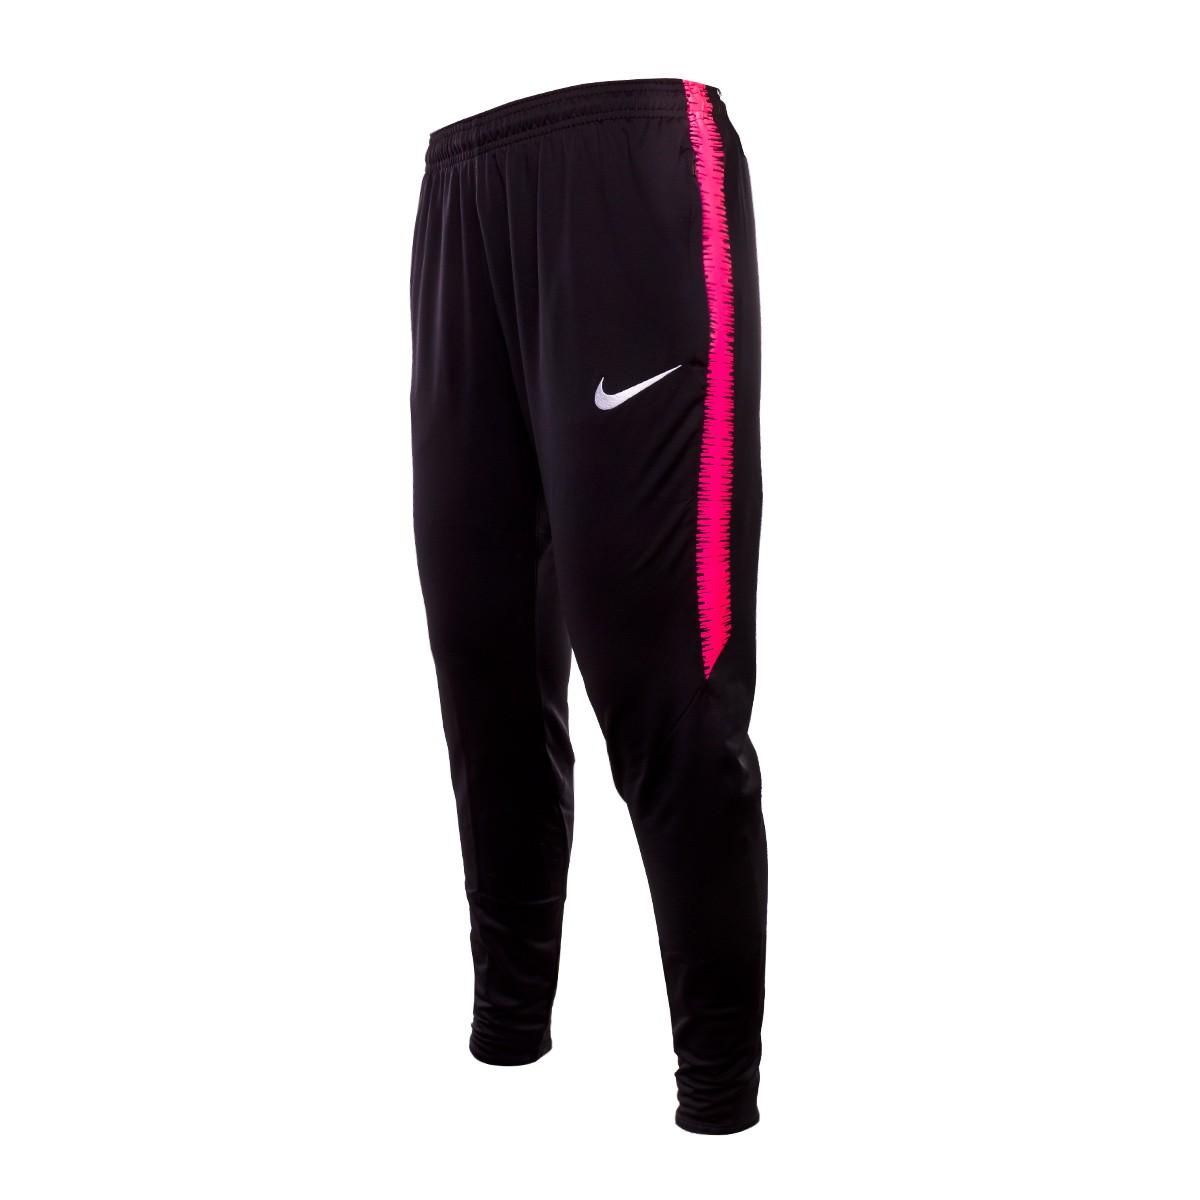 47e7e35d2a62 Long pants Nike Paris Saint-Germain Dry Squad 2018-2019 Black-Hyper ...